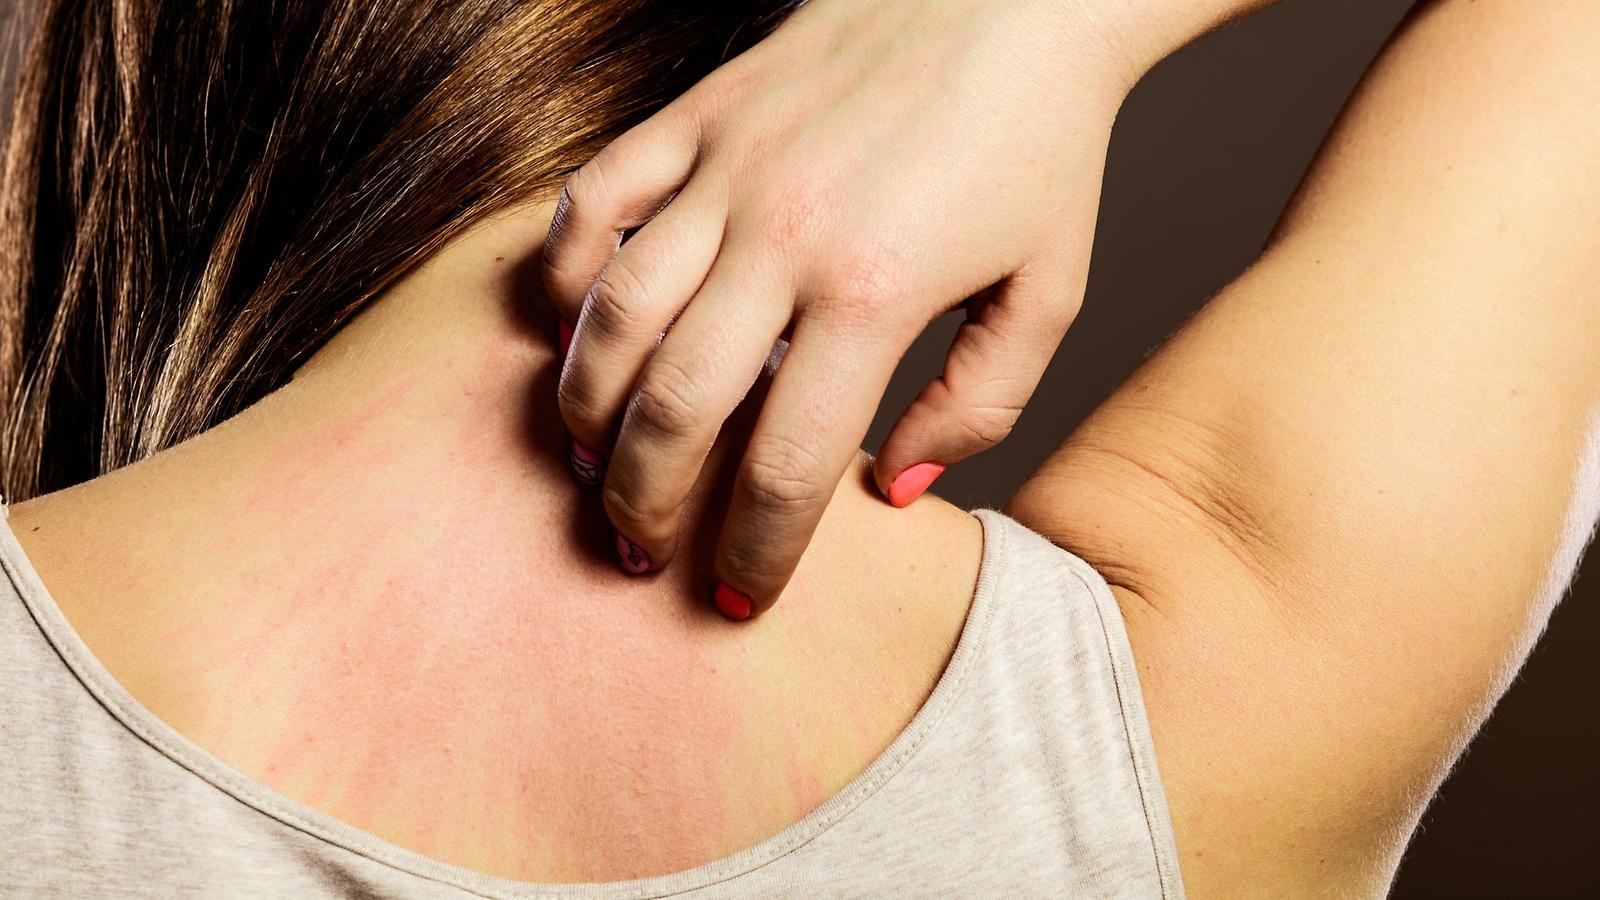 medicamentos-biologicos-sao-aposta-para-tratar-dermatite-atopica